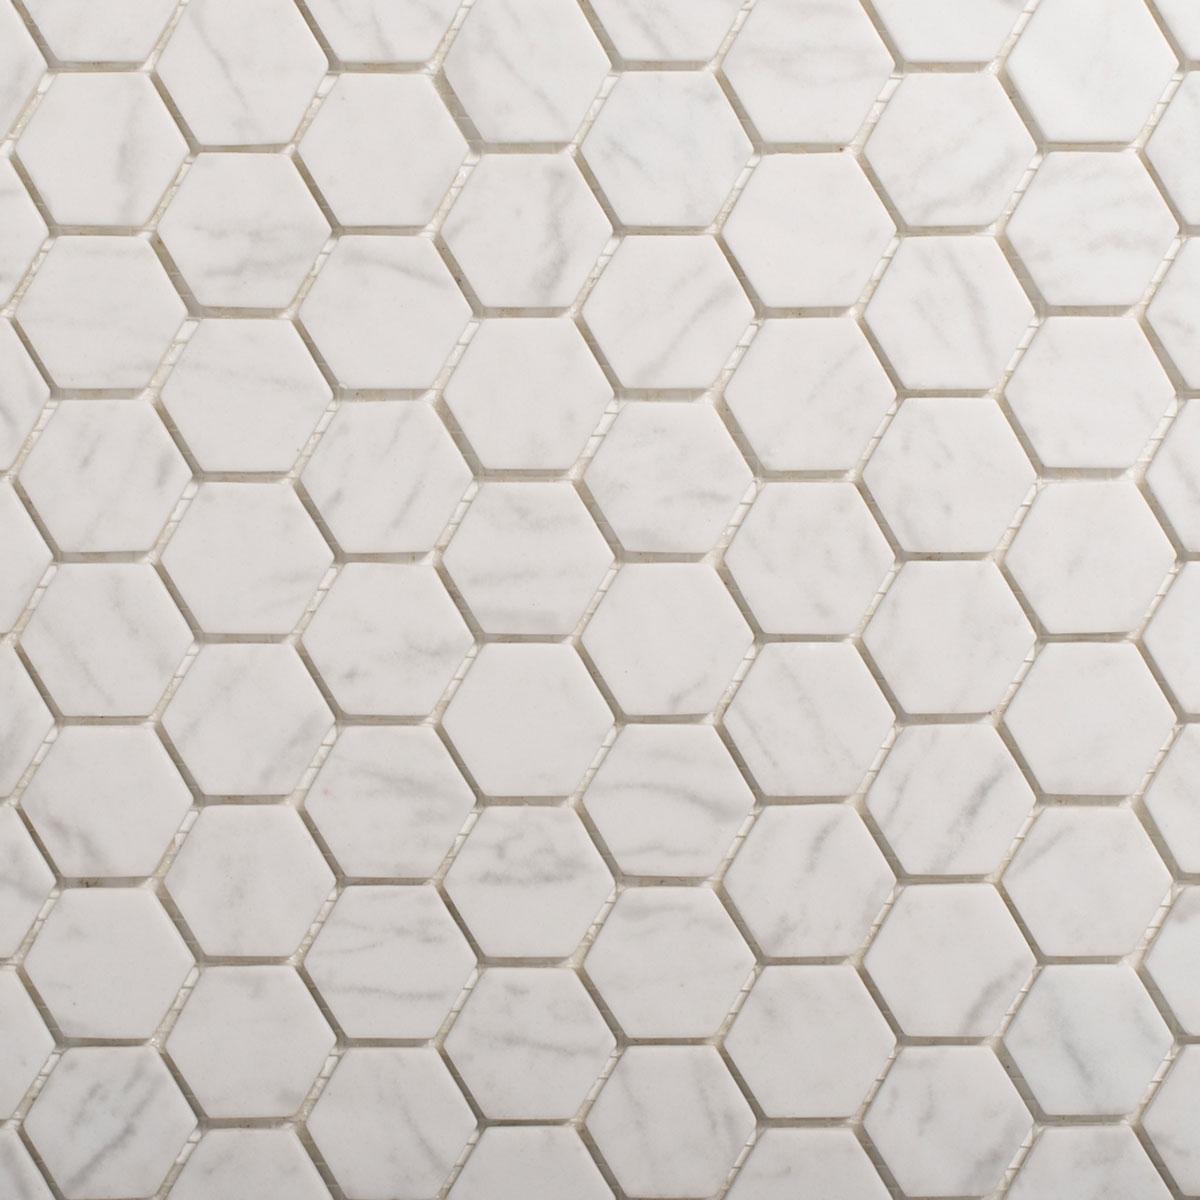 Signorino: Carrara Mosaic Hexagonal